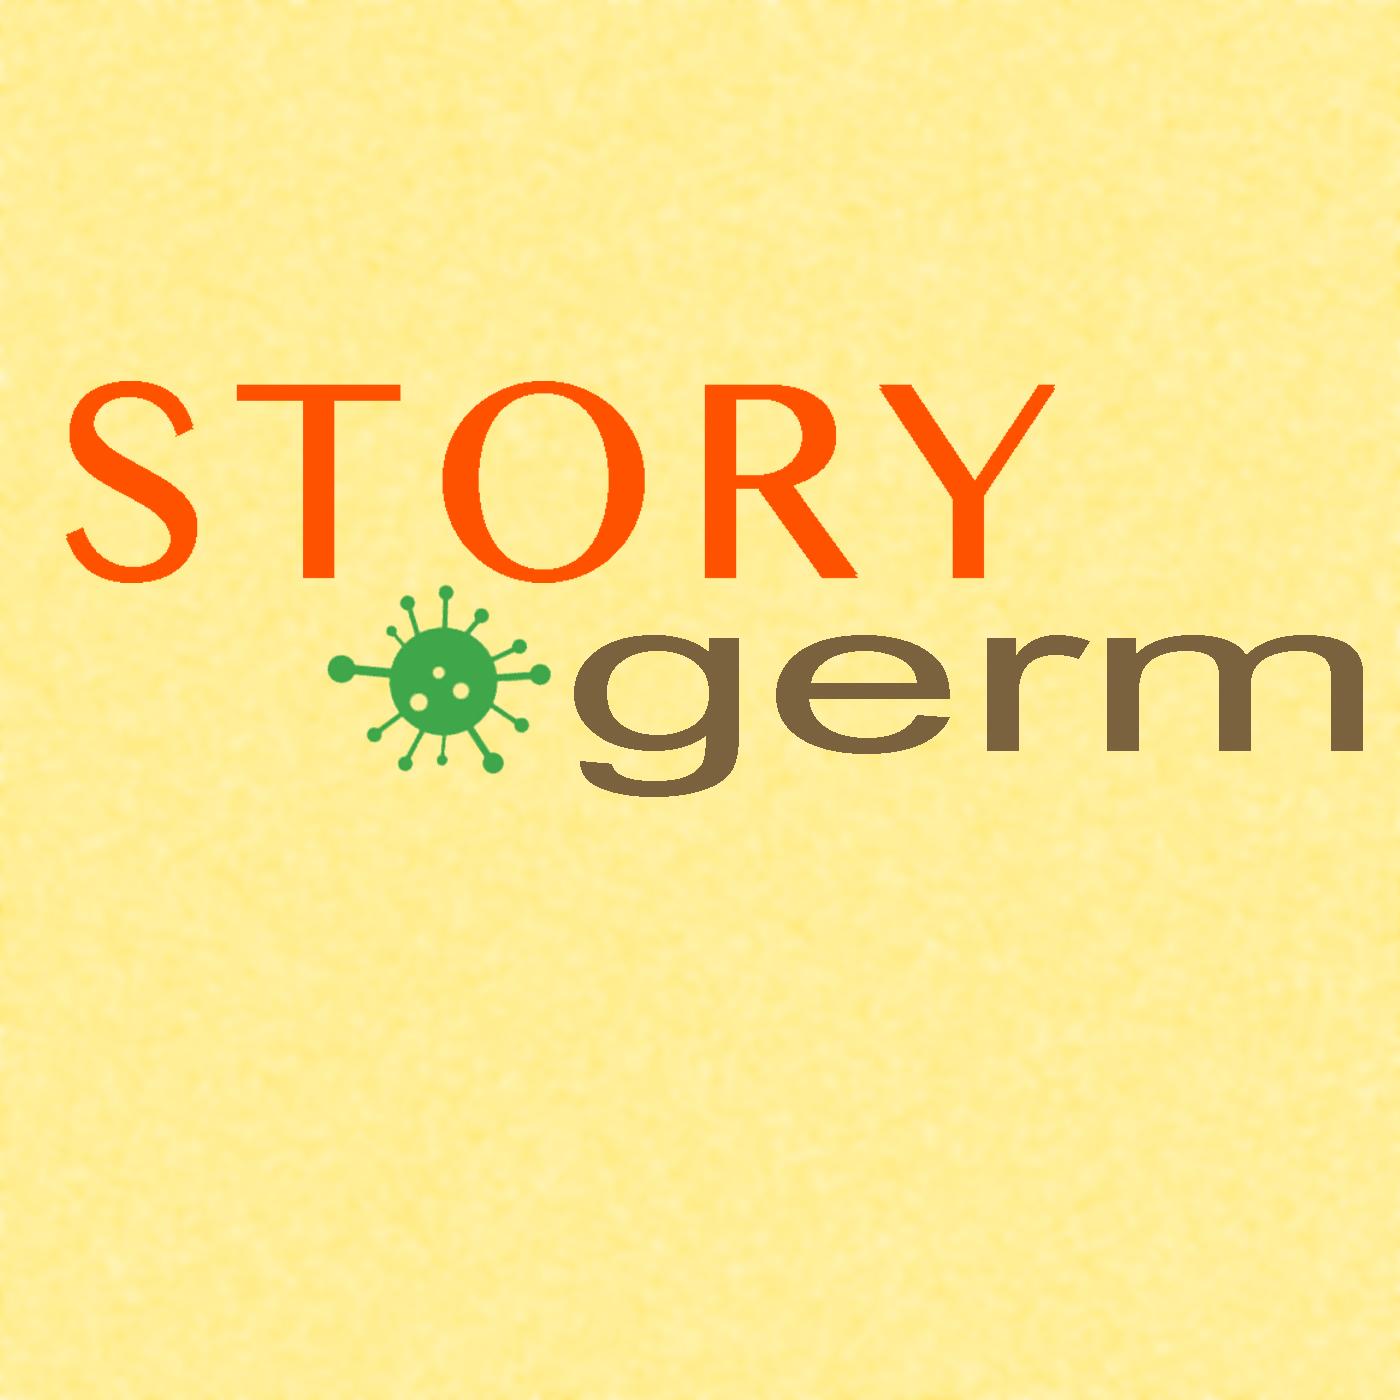 Story germ